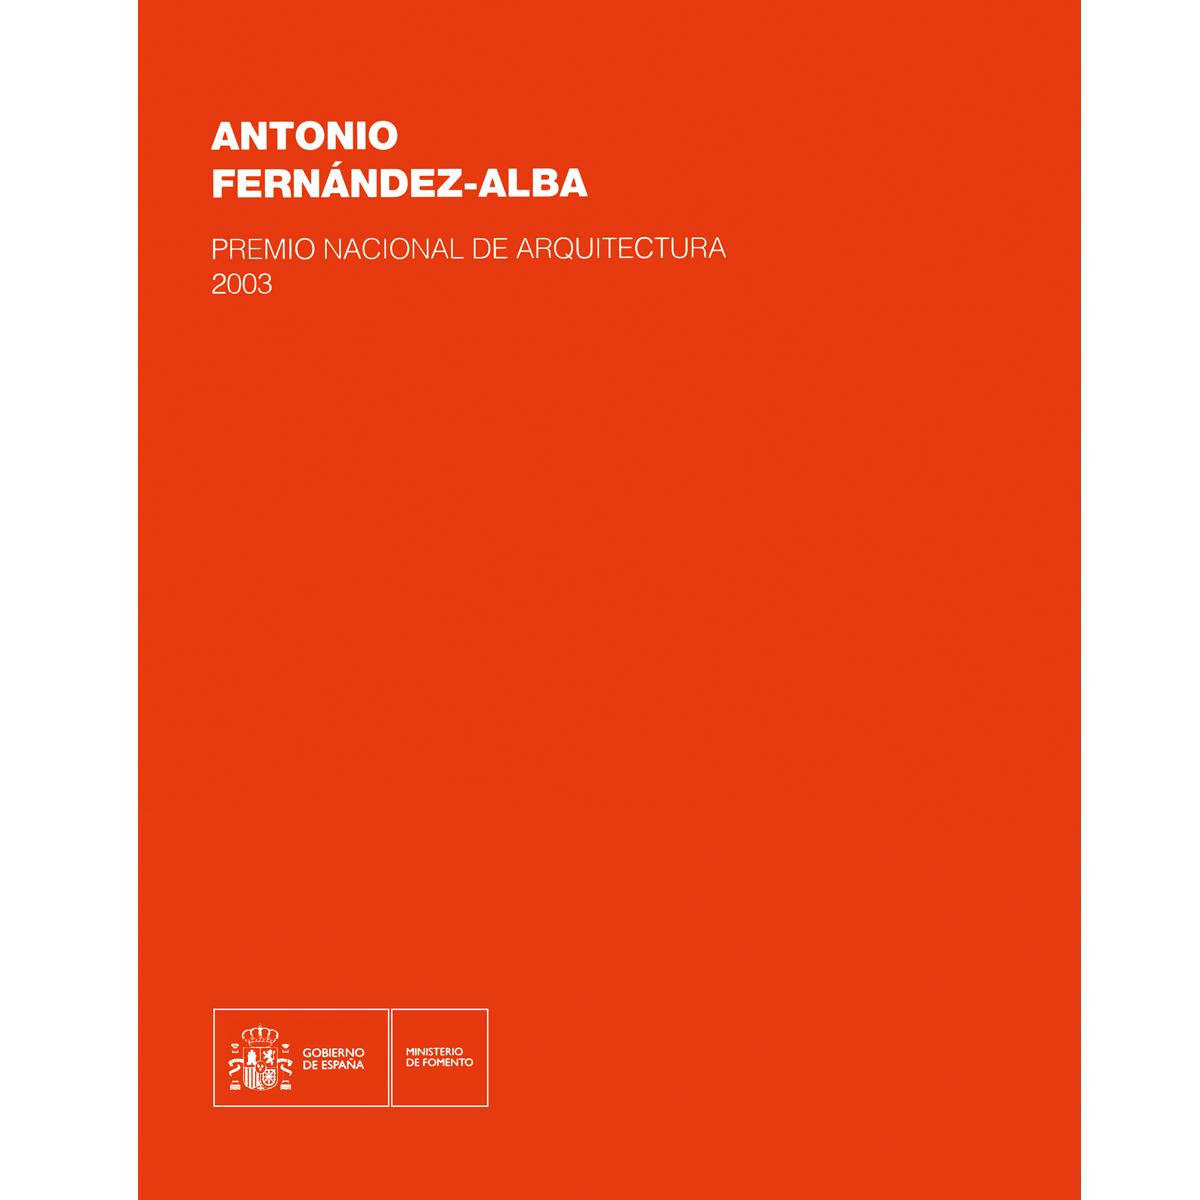 Antonio Fernández-Alba